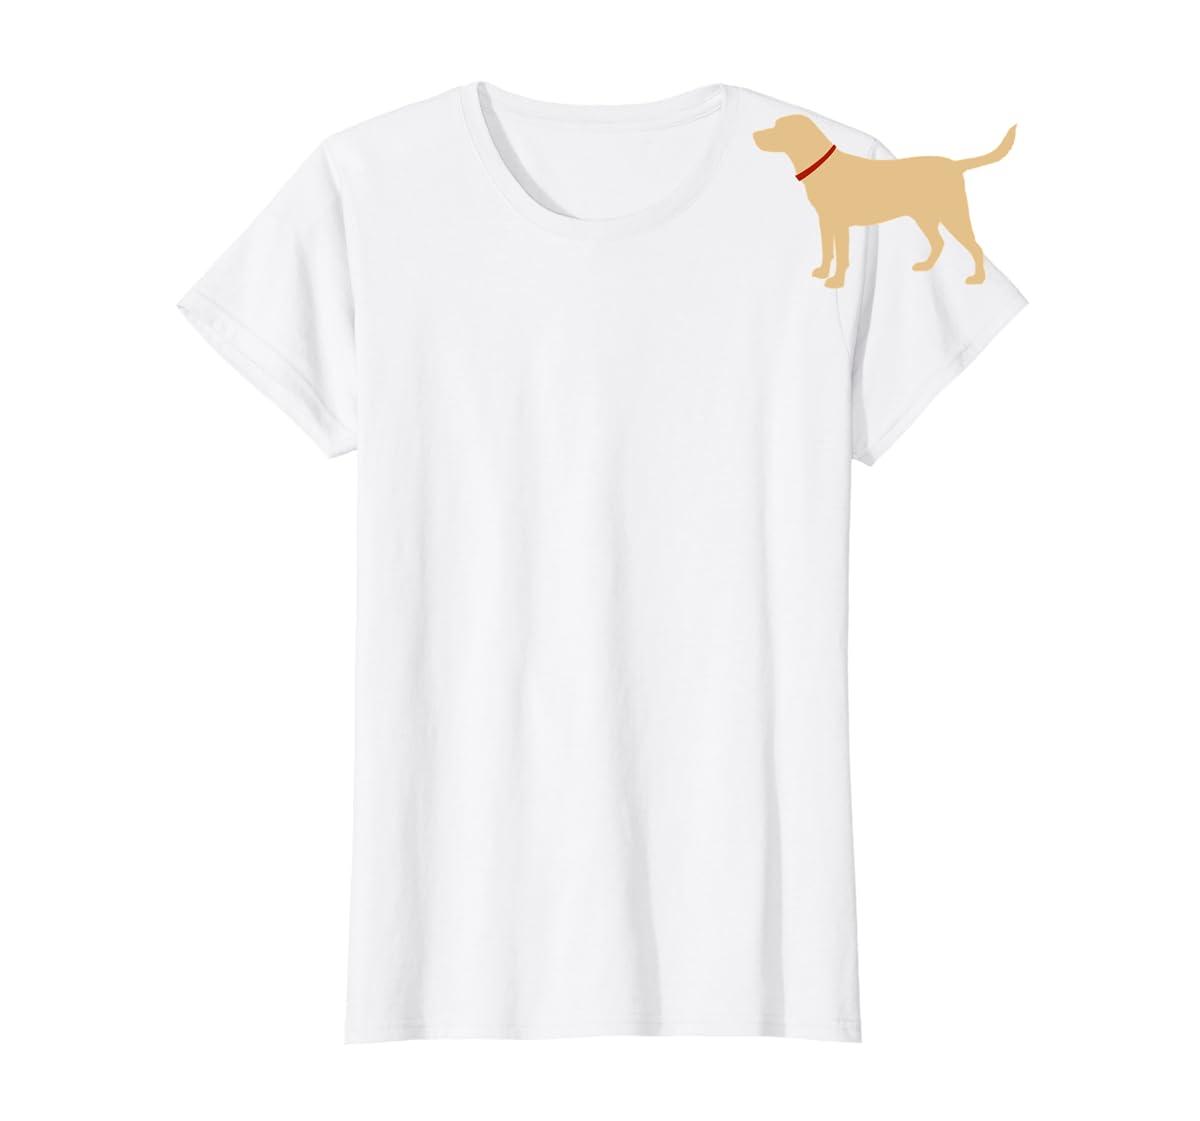 Labrador Retriever Emoji T-shirt Yellow Lab Lover Gift-Women's T-Shirt-White